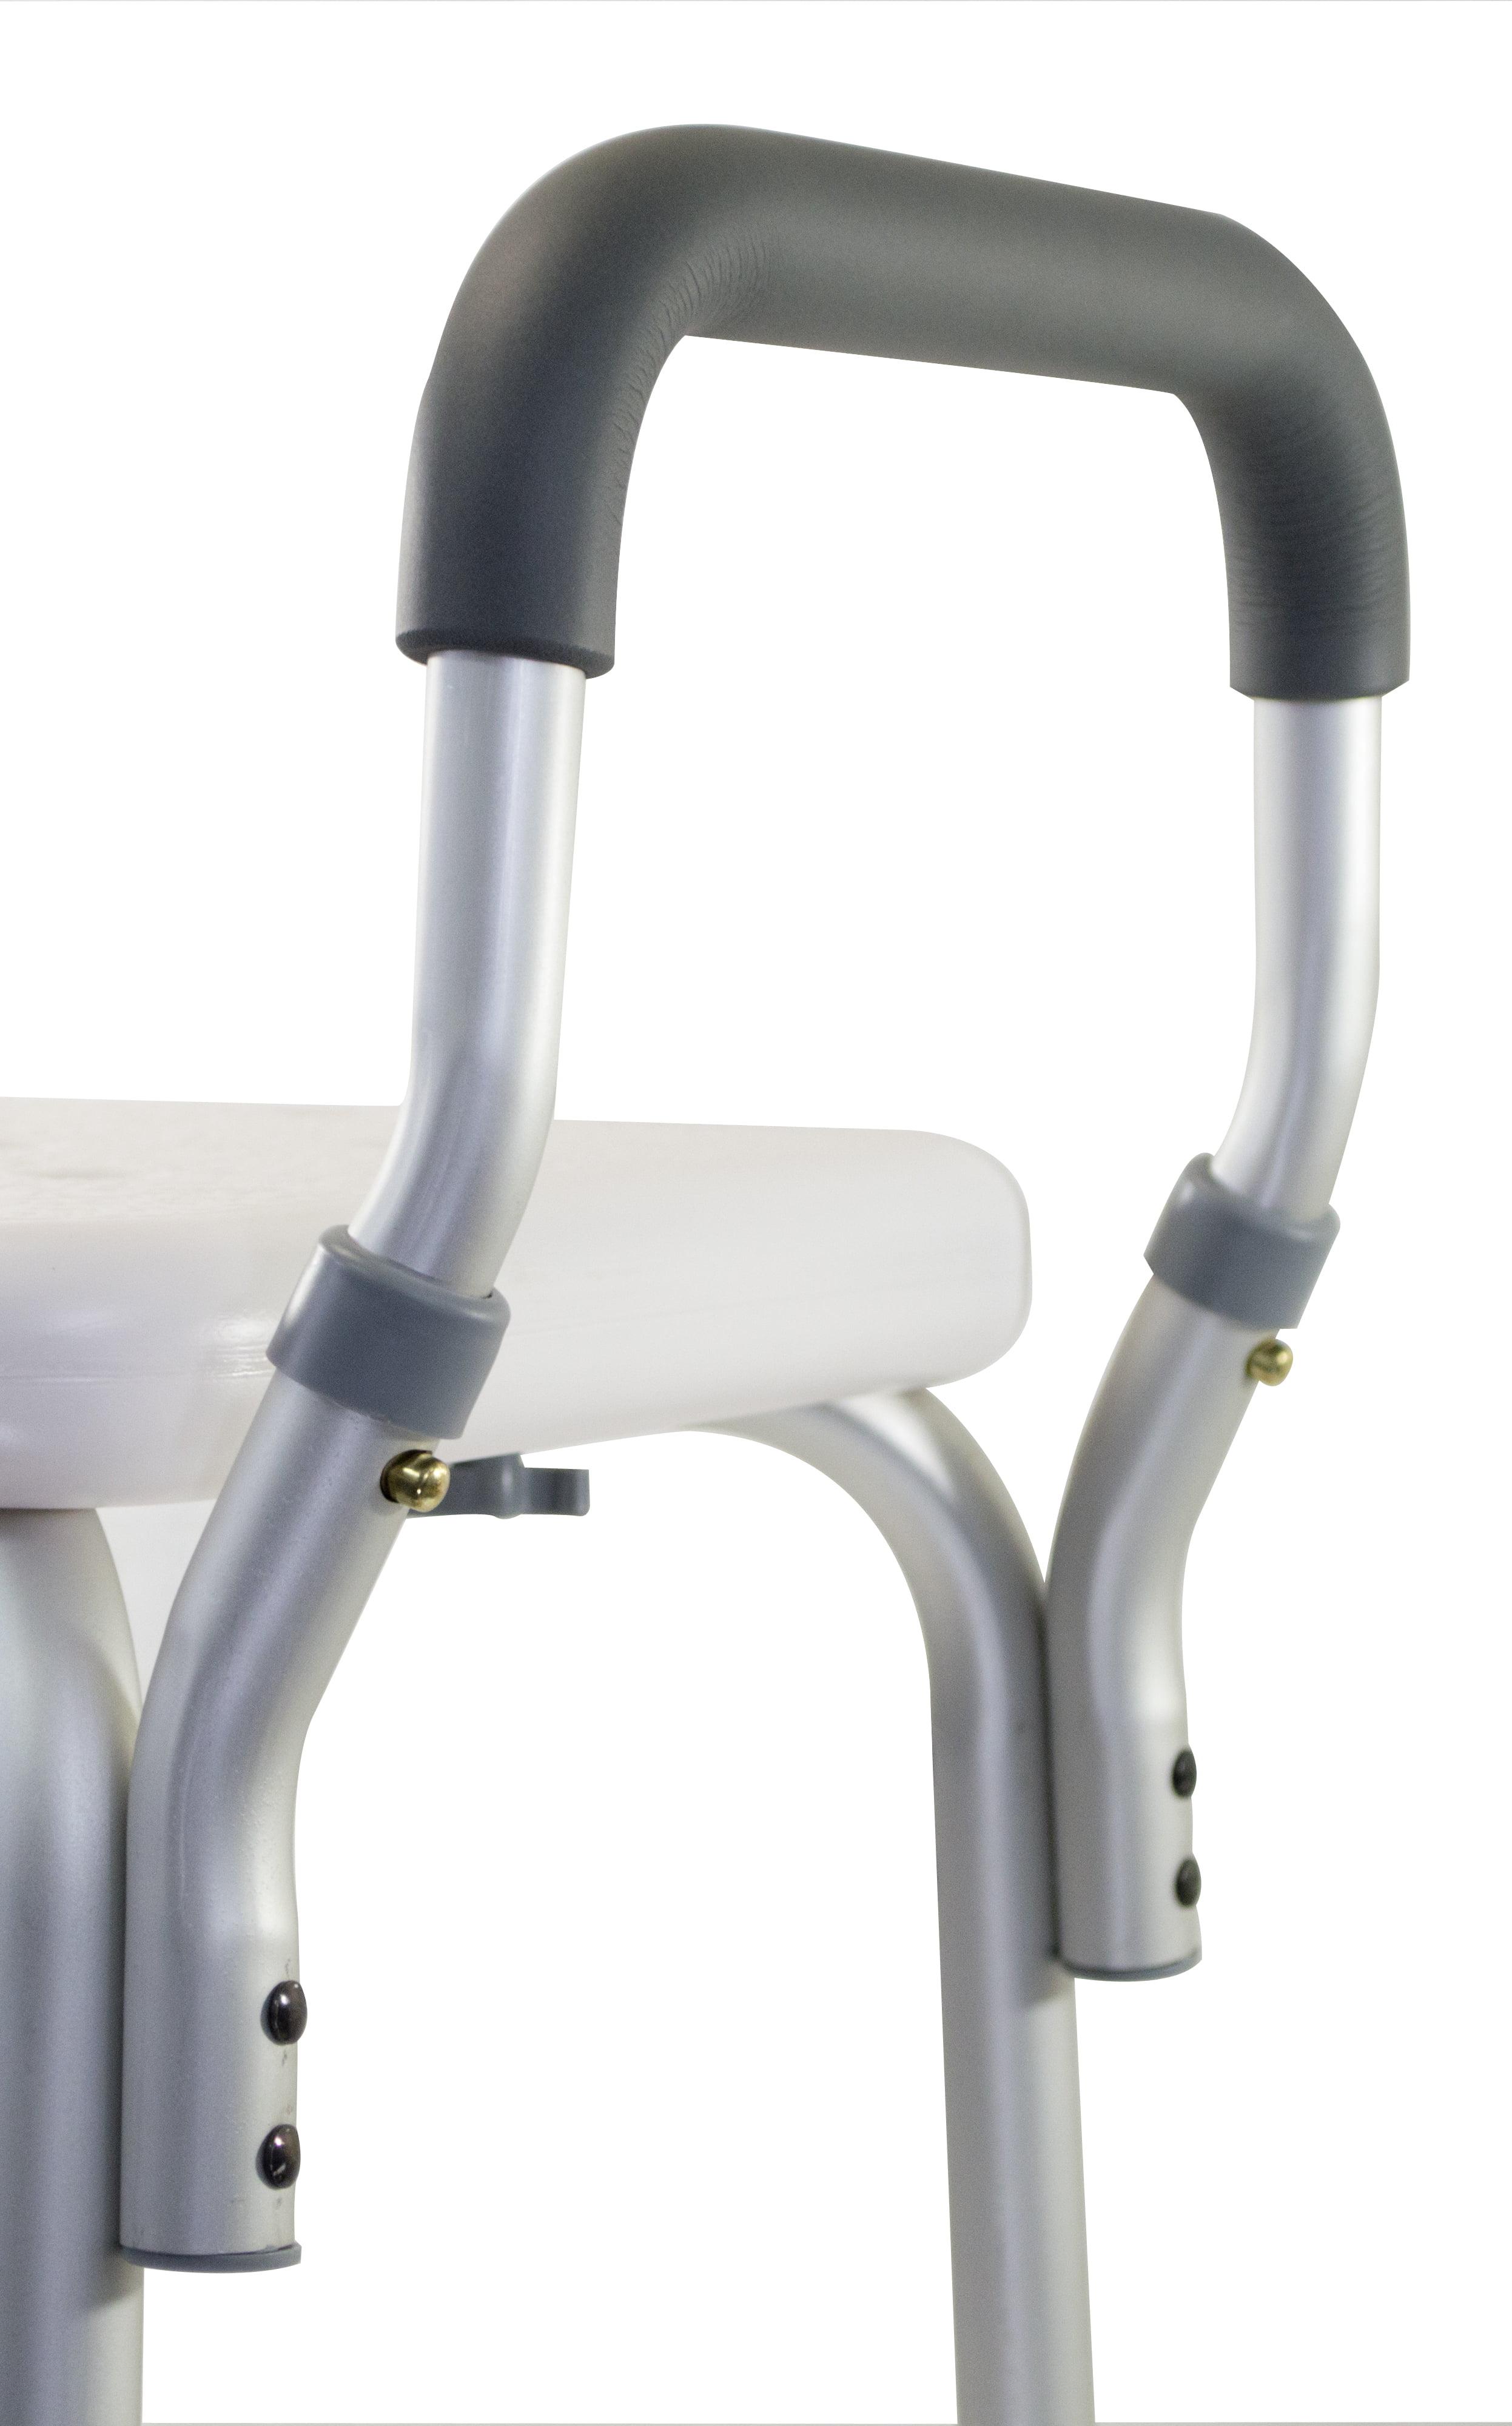 New Medical Supply Adjustable No Slip Shower Chair